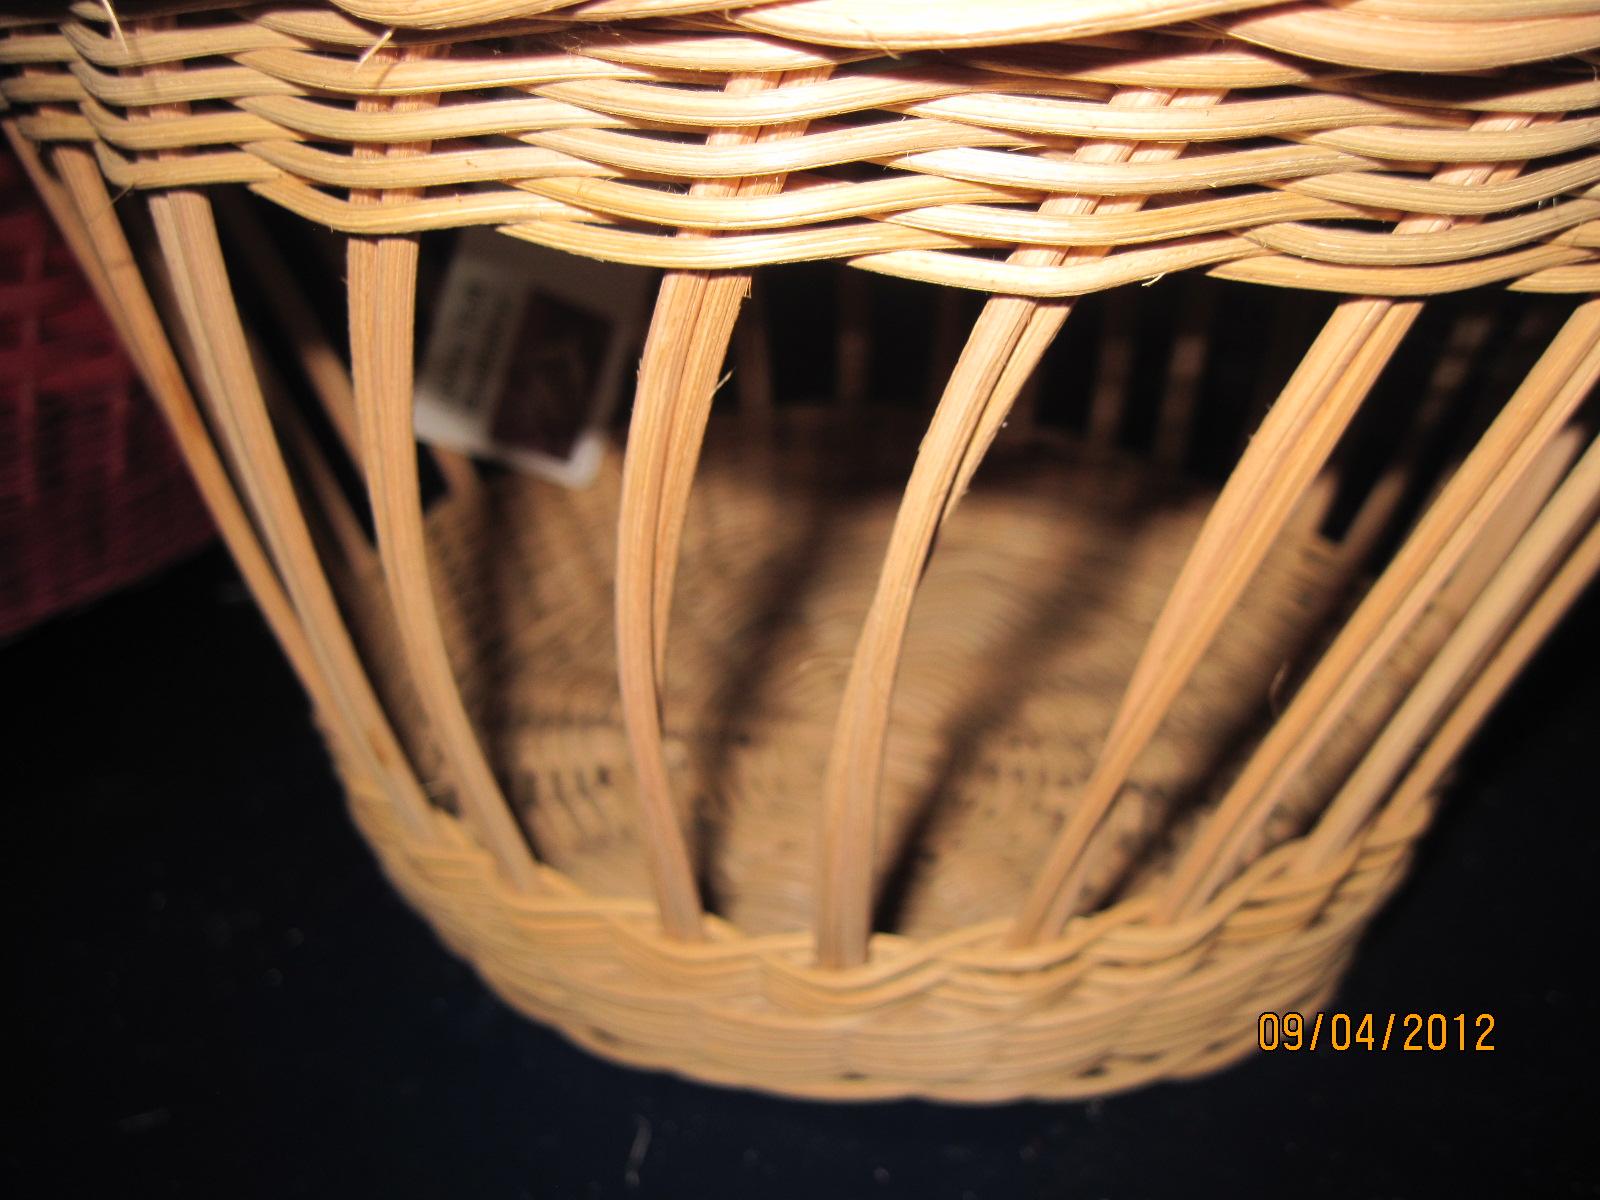 Basket Weaving Dyed Reed : John toft basketry upgrading open weave baskets